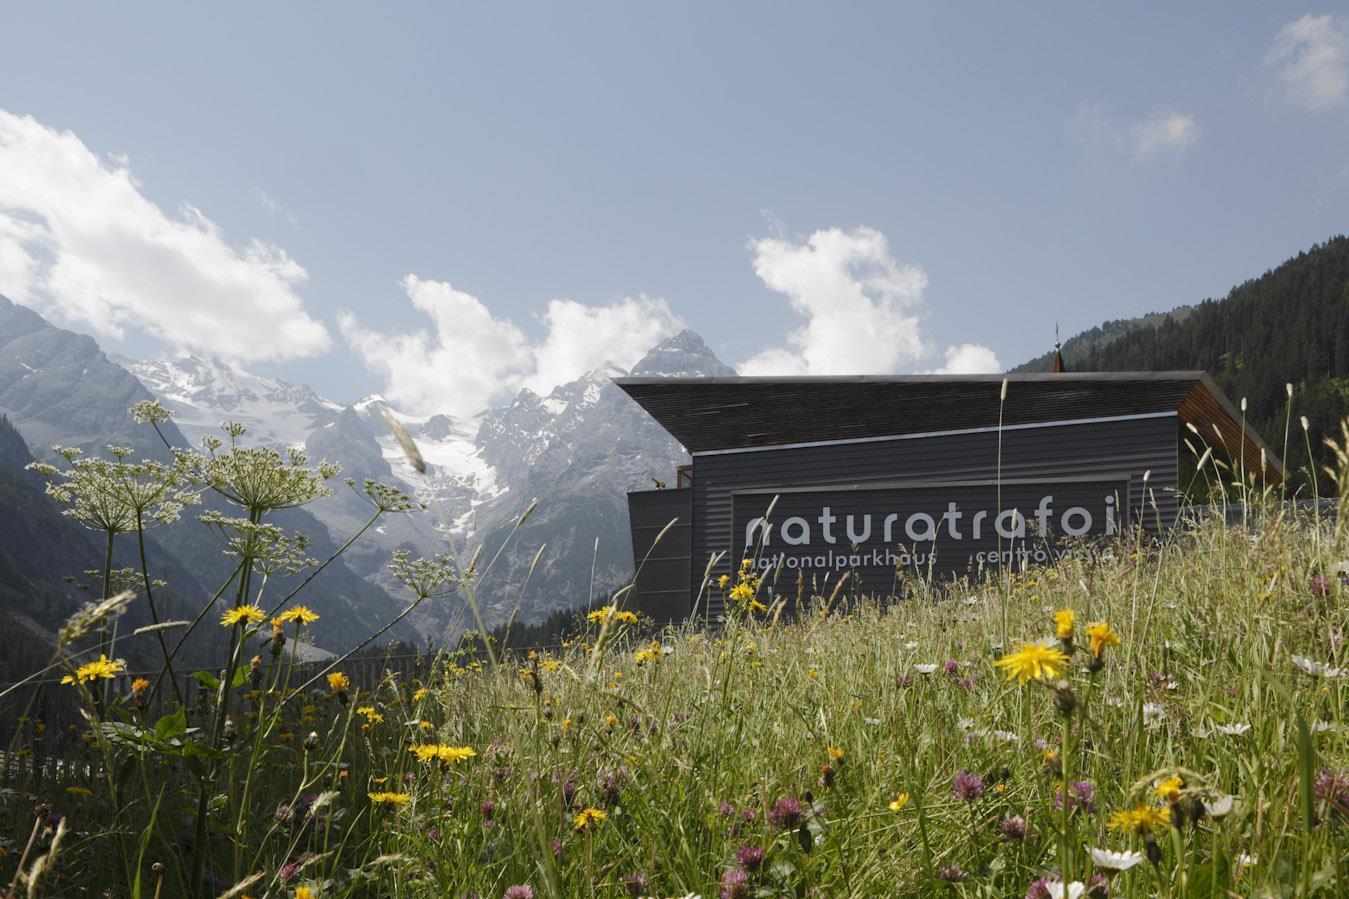 National Park visitor centre naturatrafoi